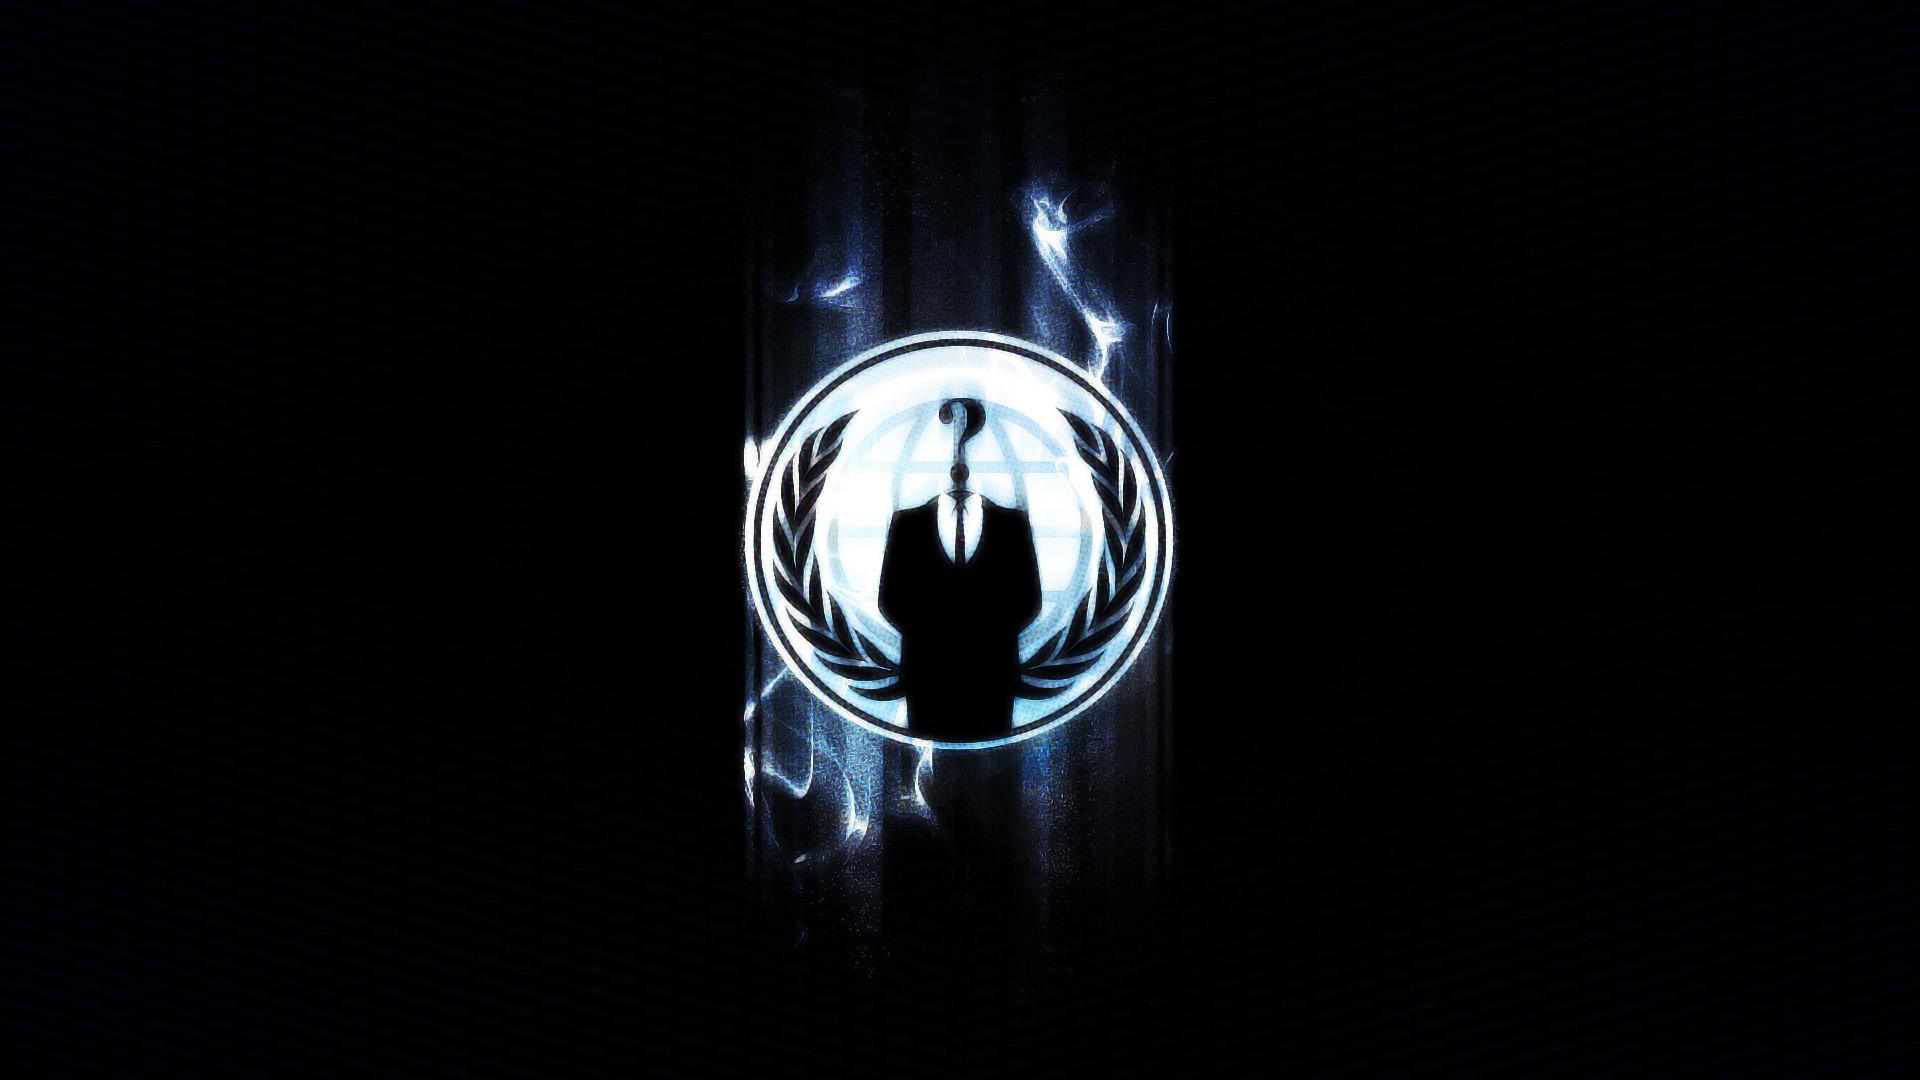 anonymous background - photo #19